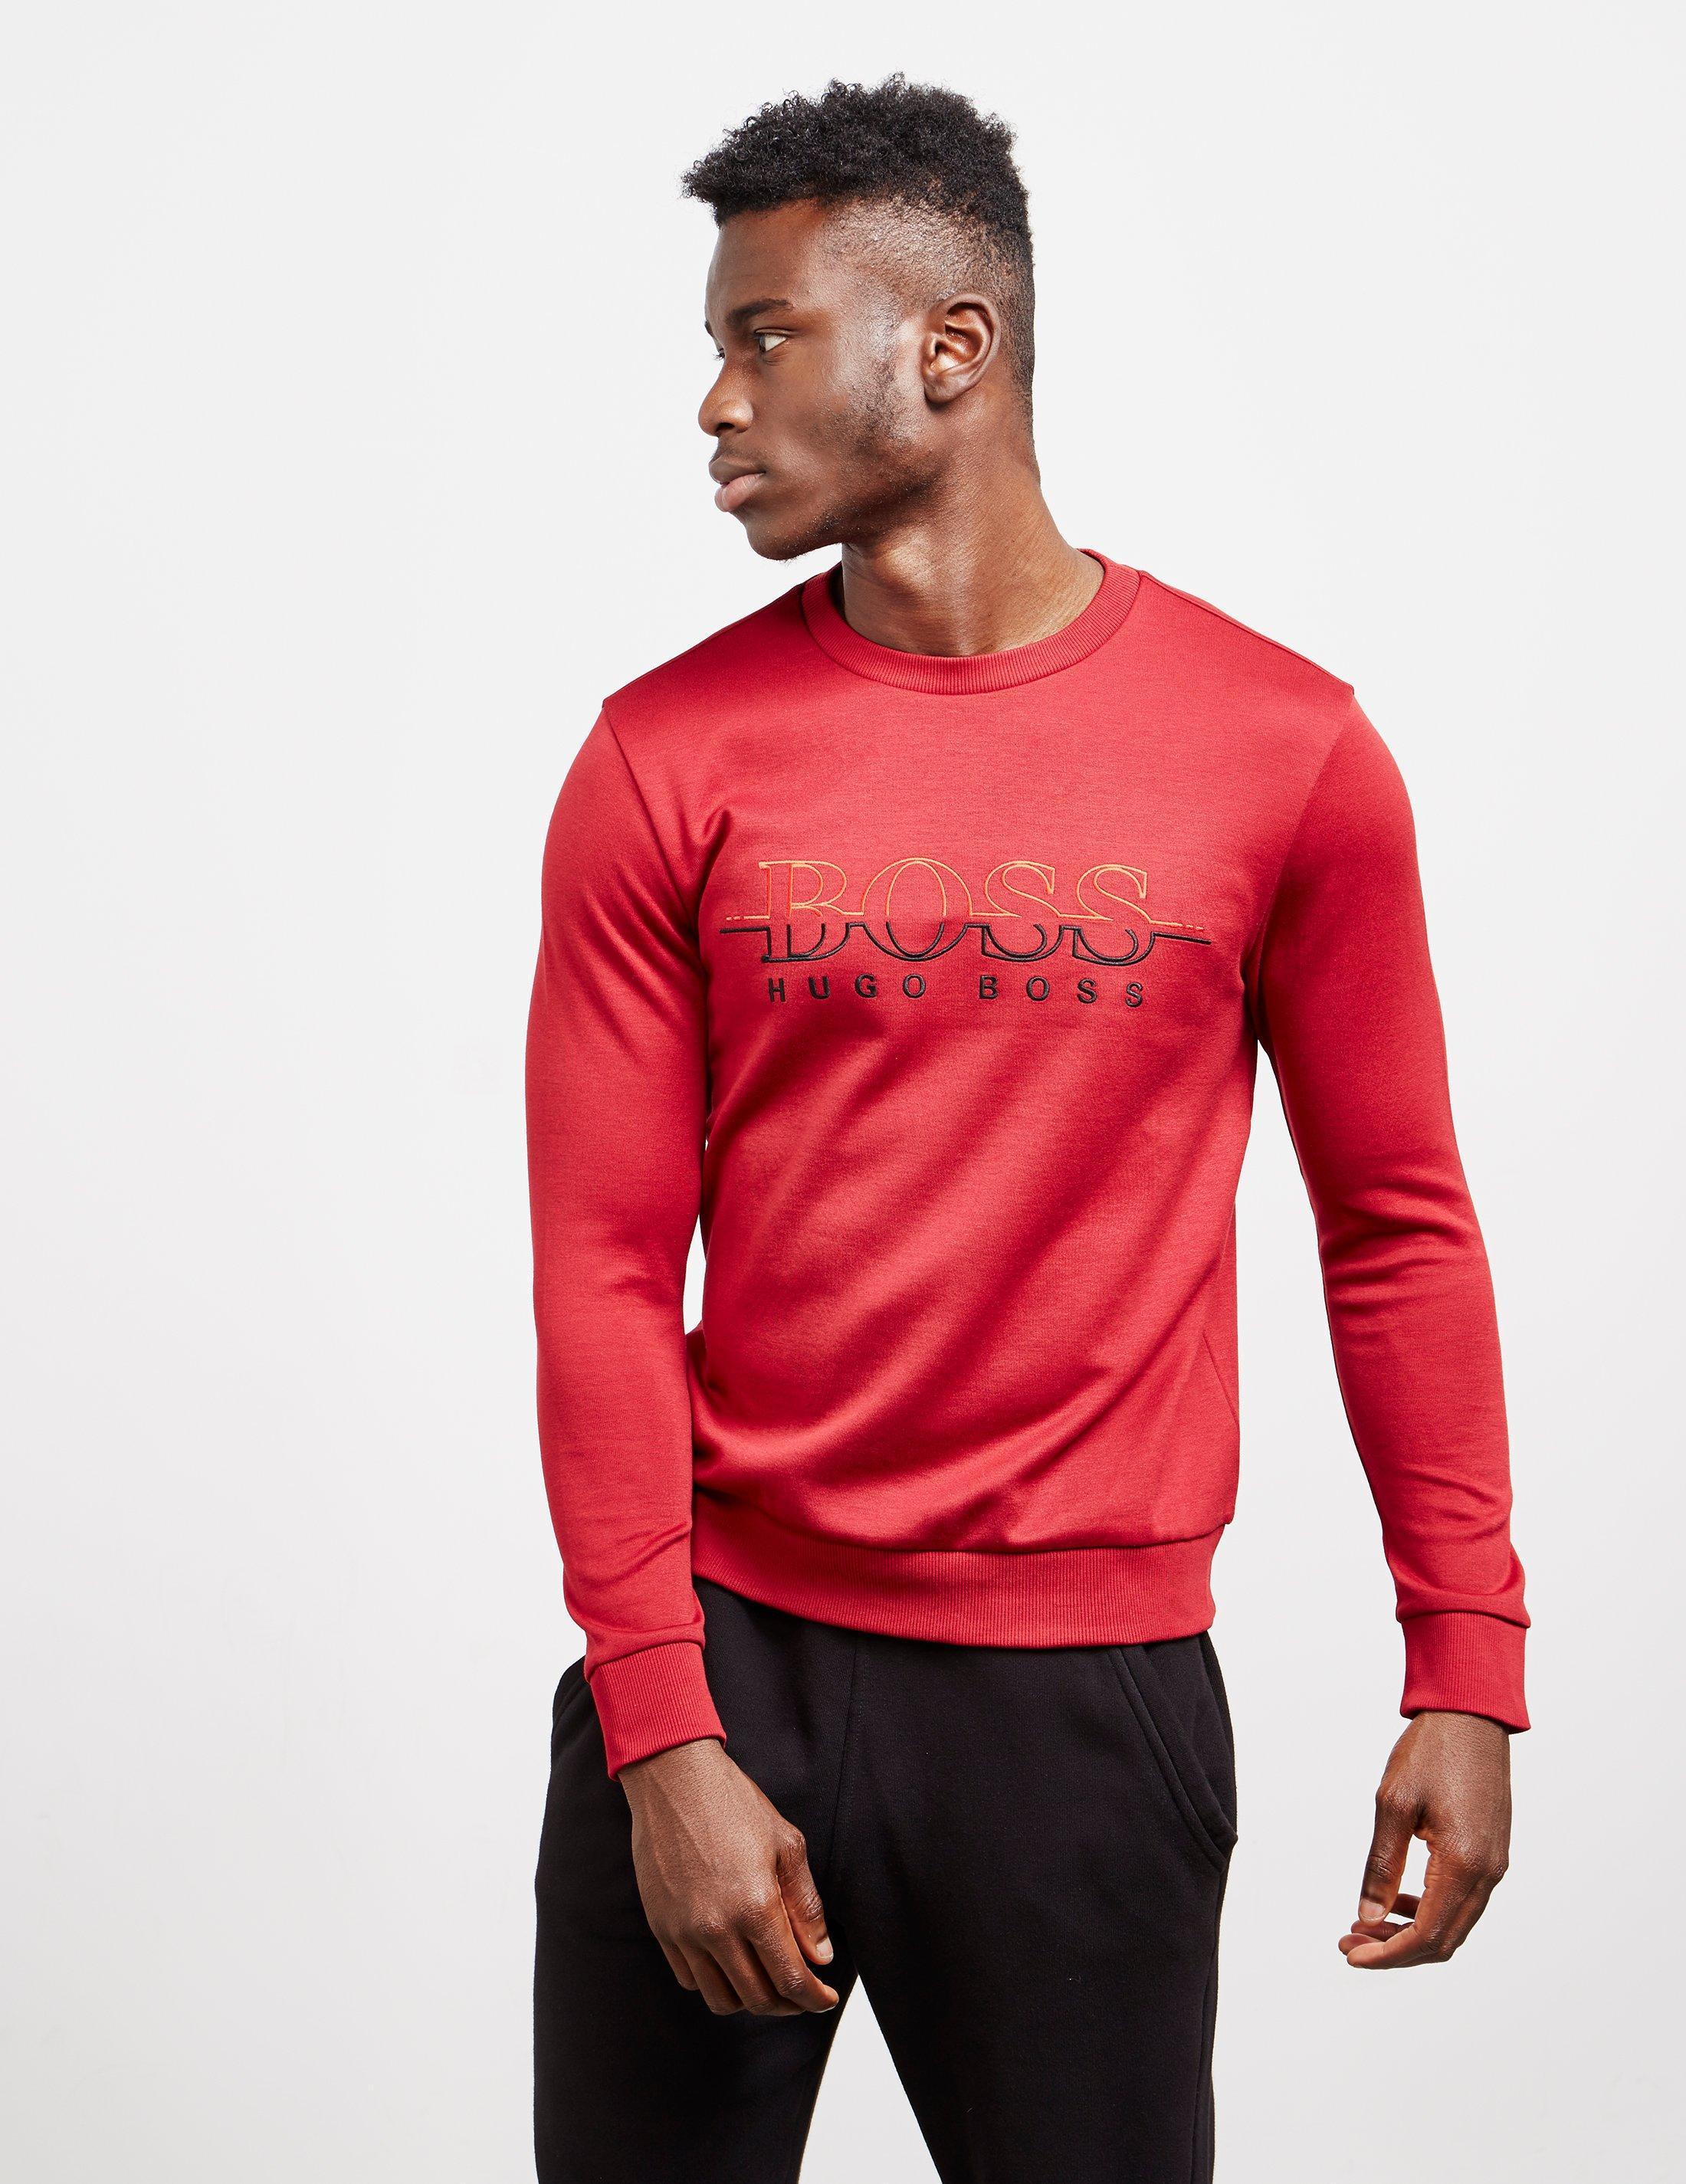 d36260b47 Boss Mens Salbo Crew Neck Sweatshirt Red in Red for Men - Lyst